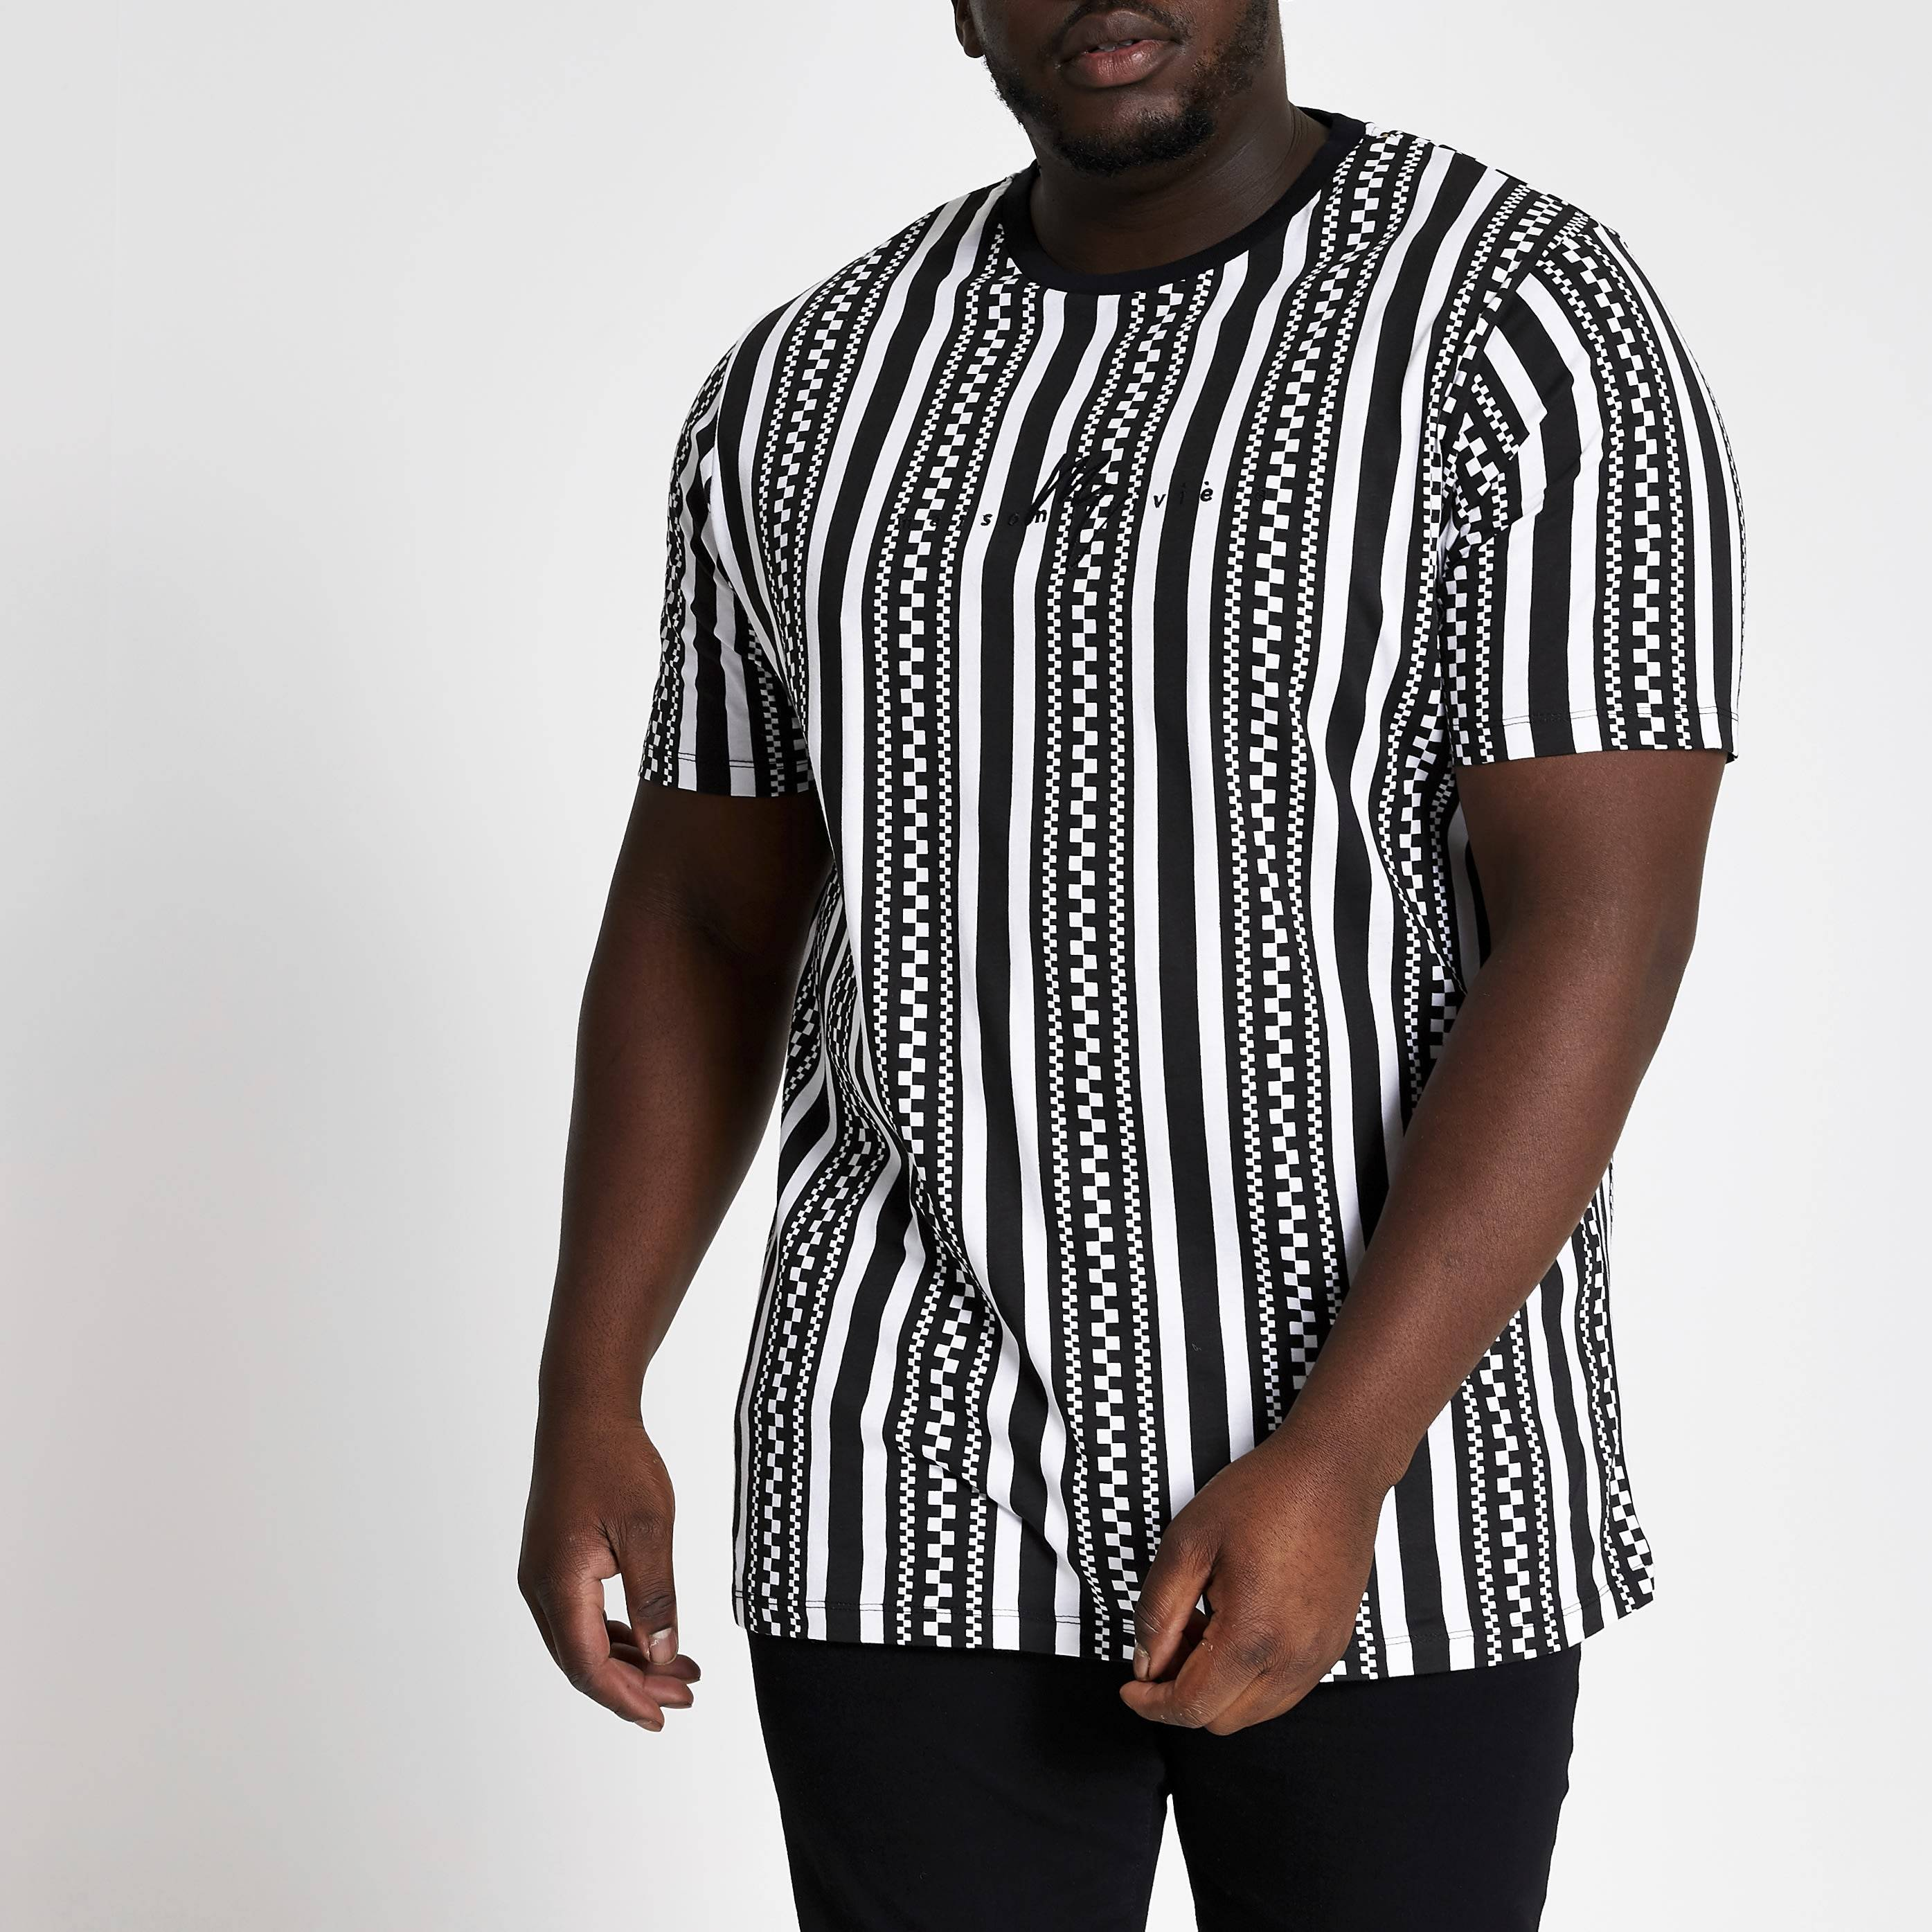 River Island Mens Big and Tall Black Maison slim fit T-shirt (XXXXXL)